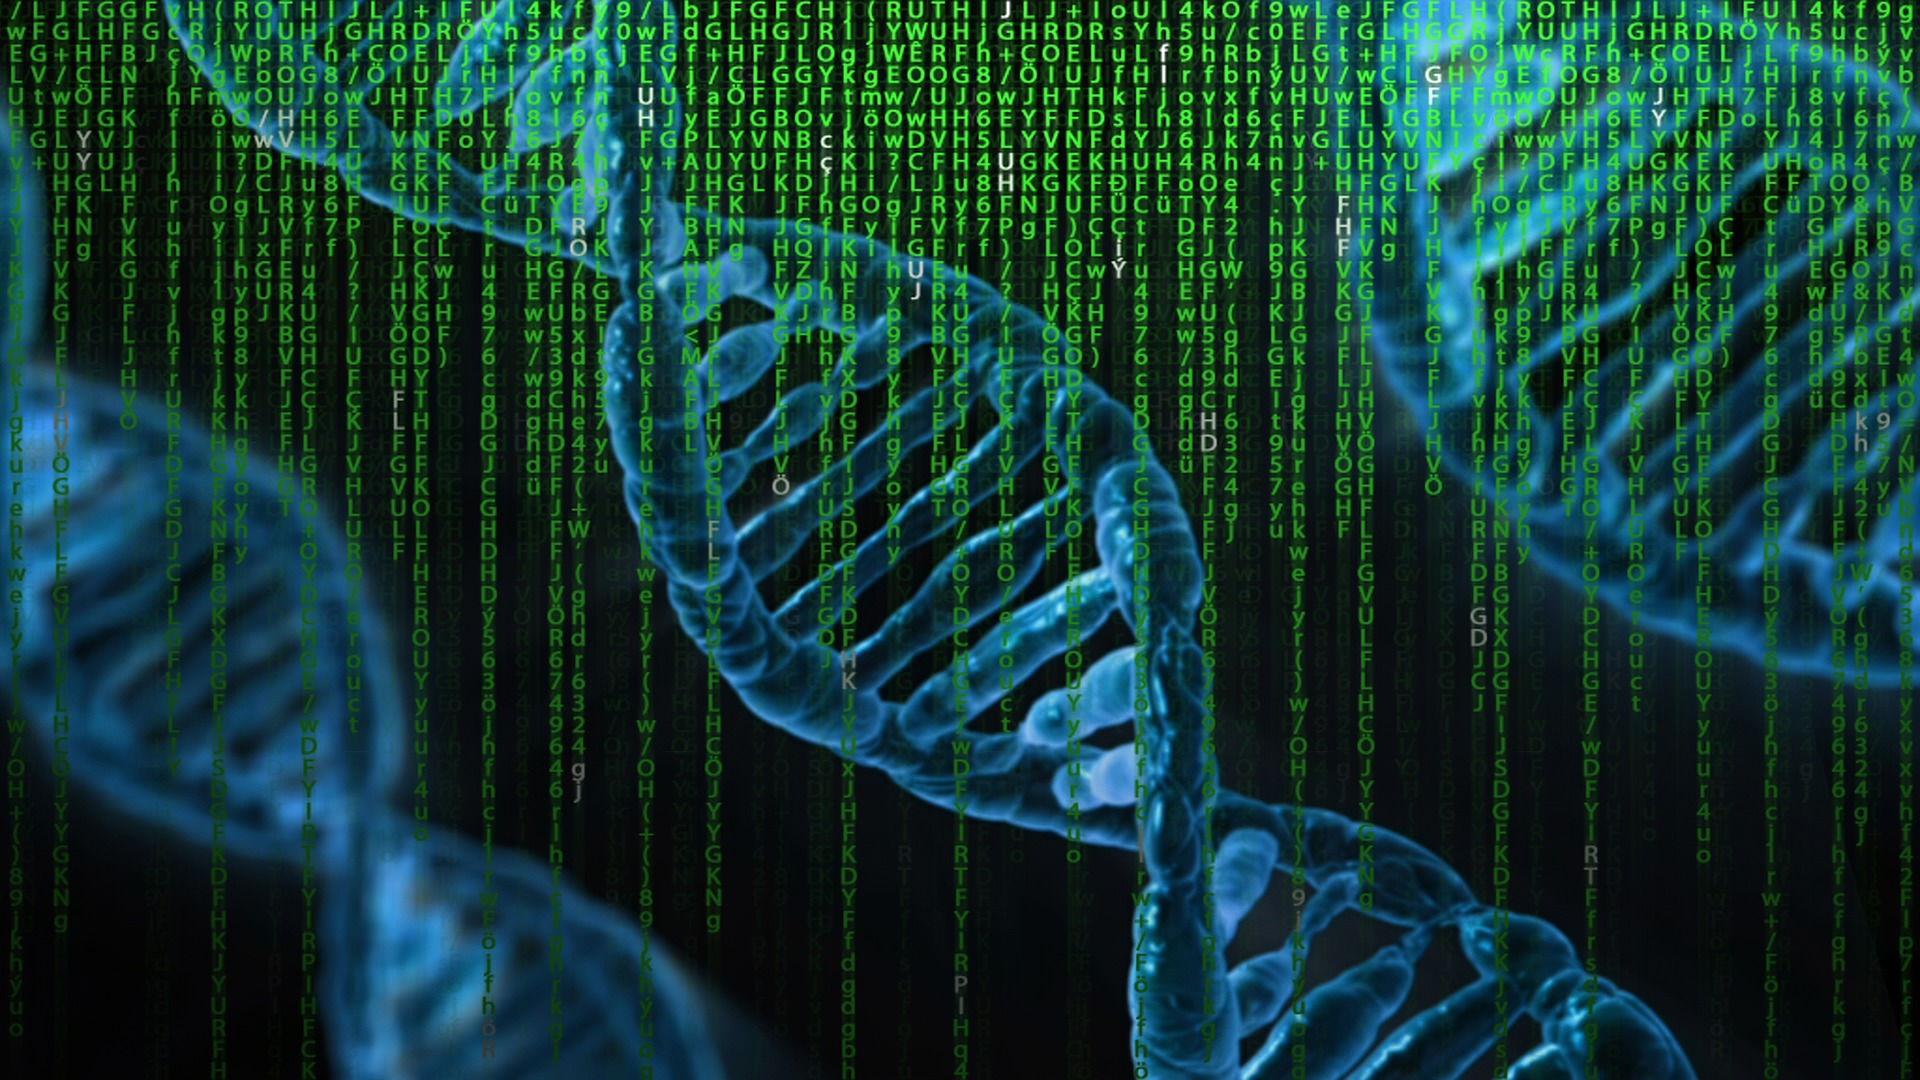 Ilustracja trzech nici DNA.